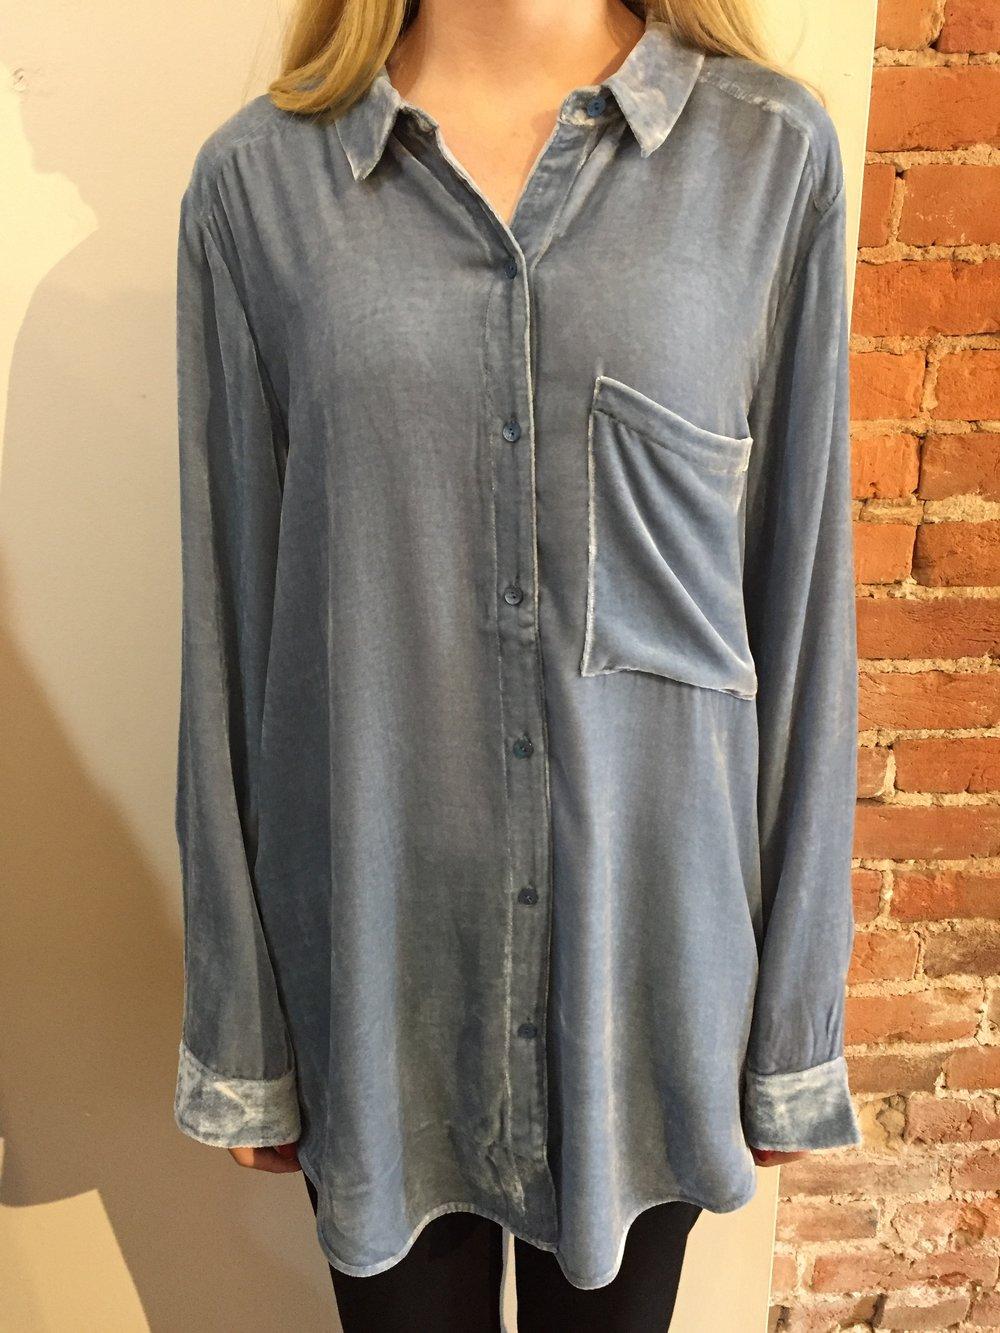 b7c03c98f8430 Eileen Fisher Velvet Button Down Long Sleeve Shirt — Mirror Image Fashions